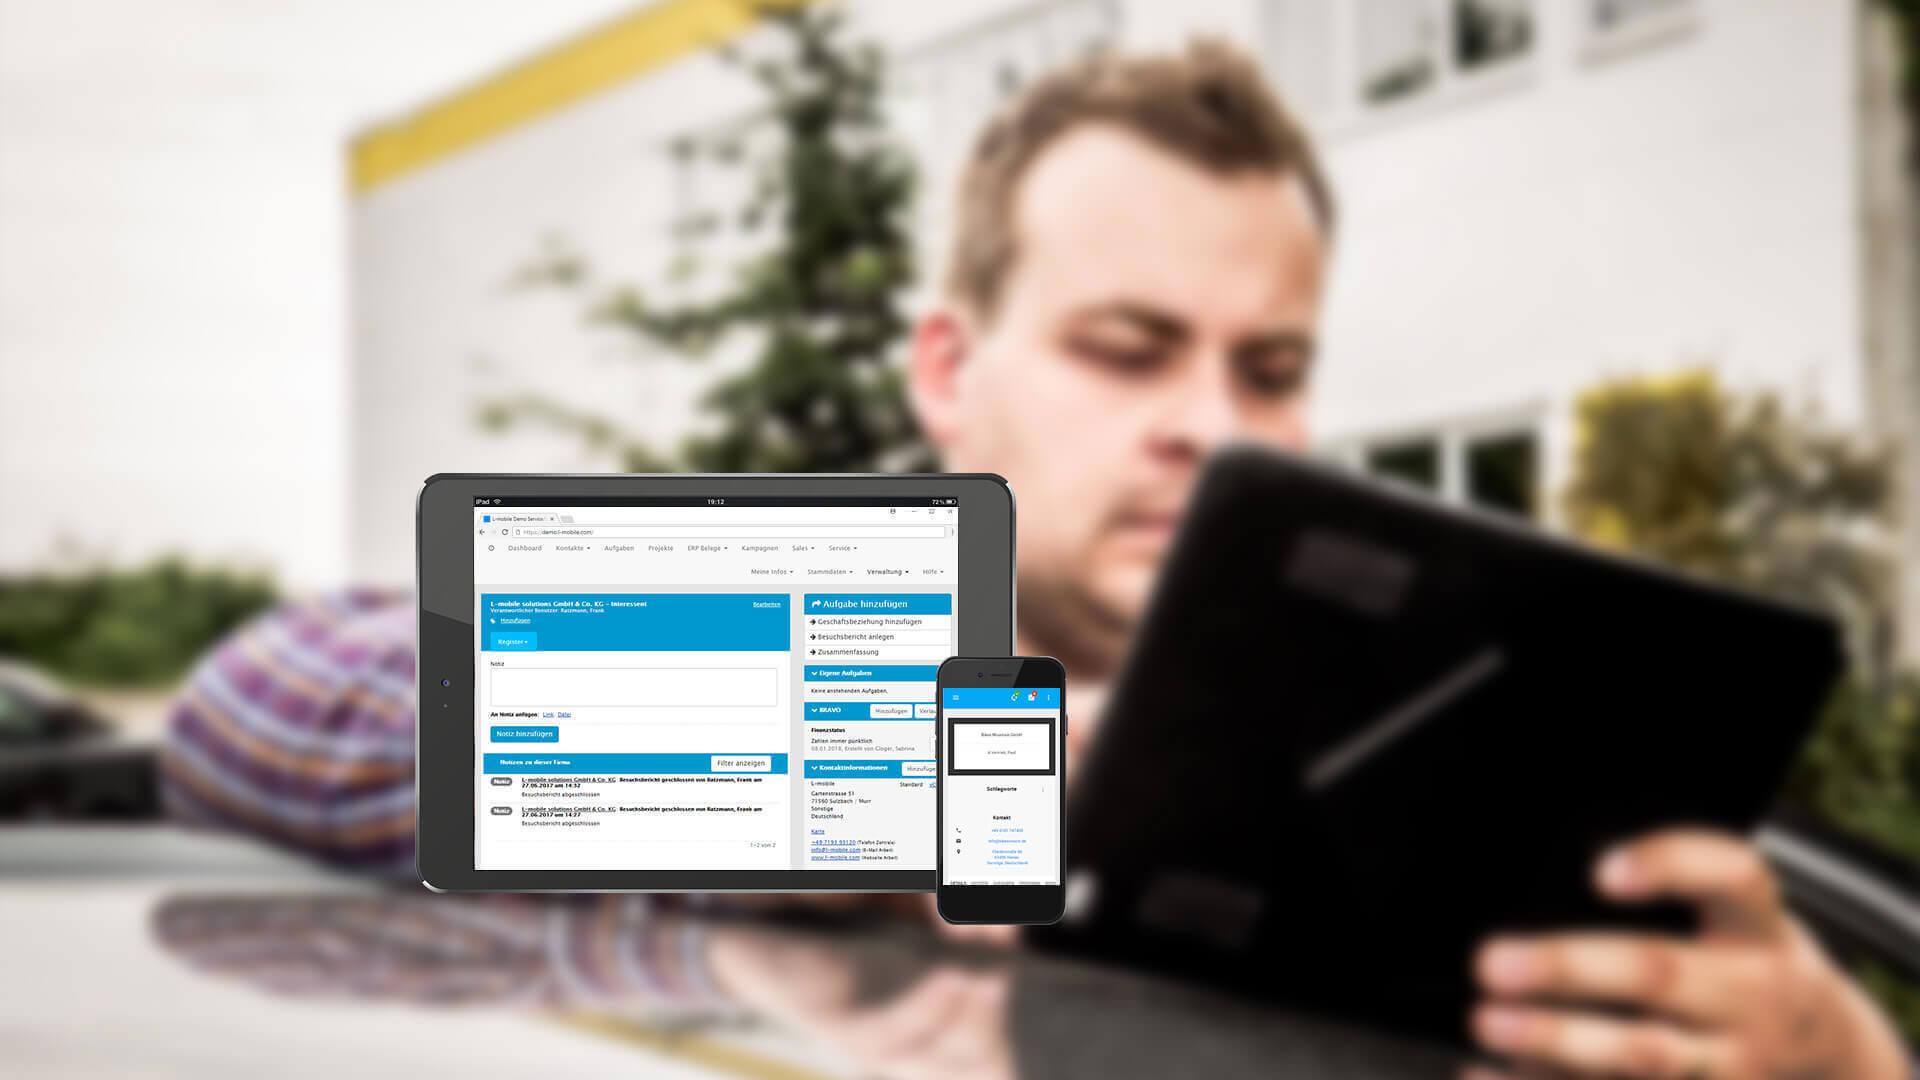 L-mobile Mobiler Vertrieb Funktionen vollintegriertes CRM